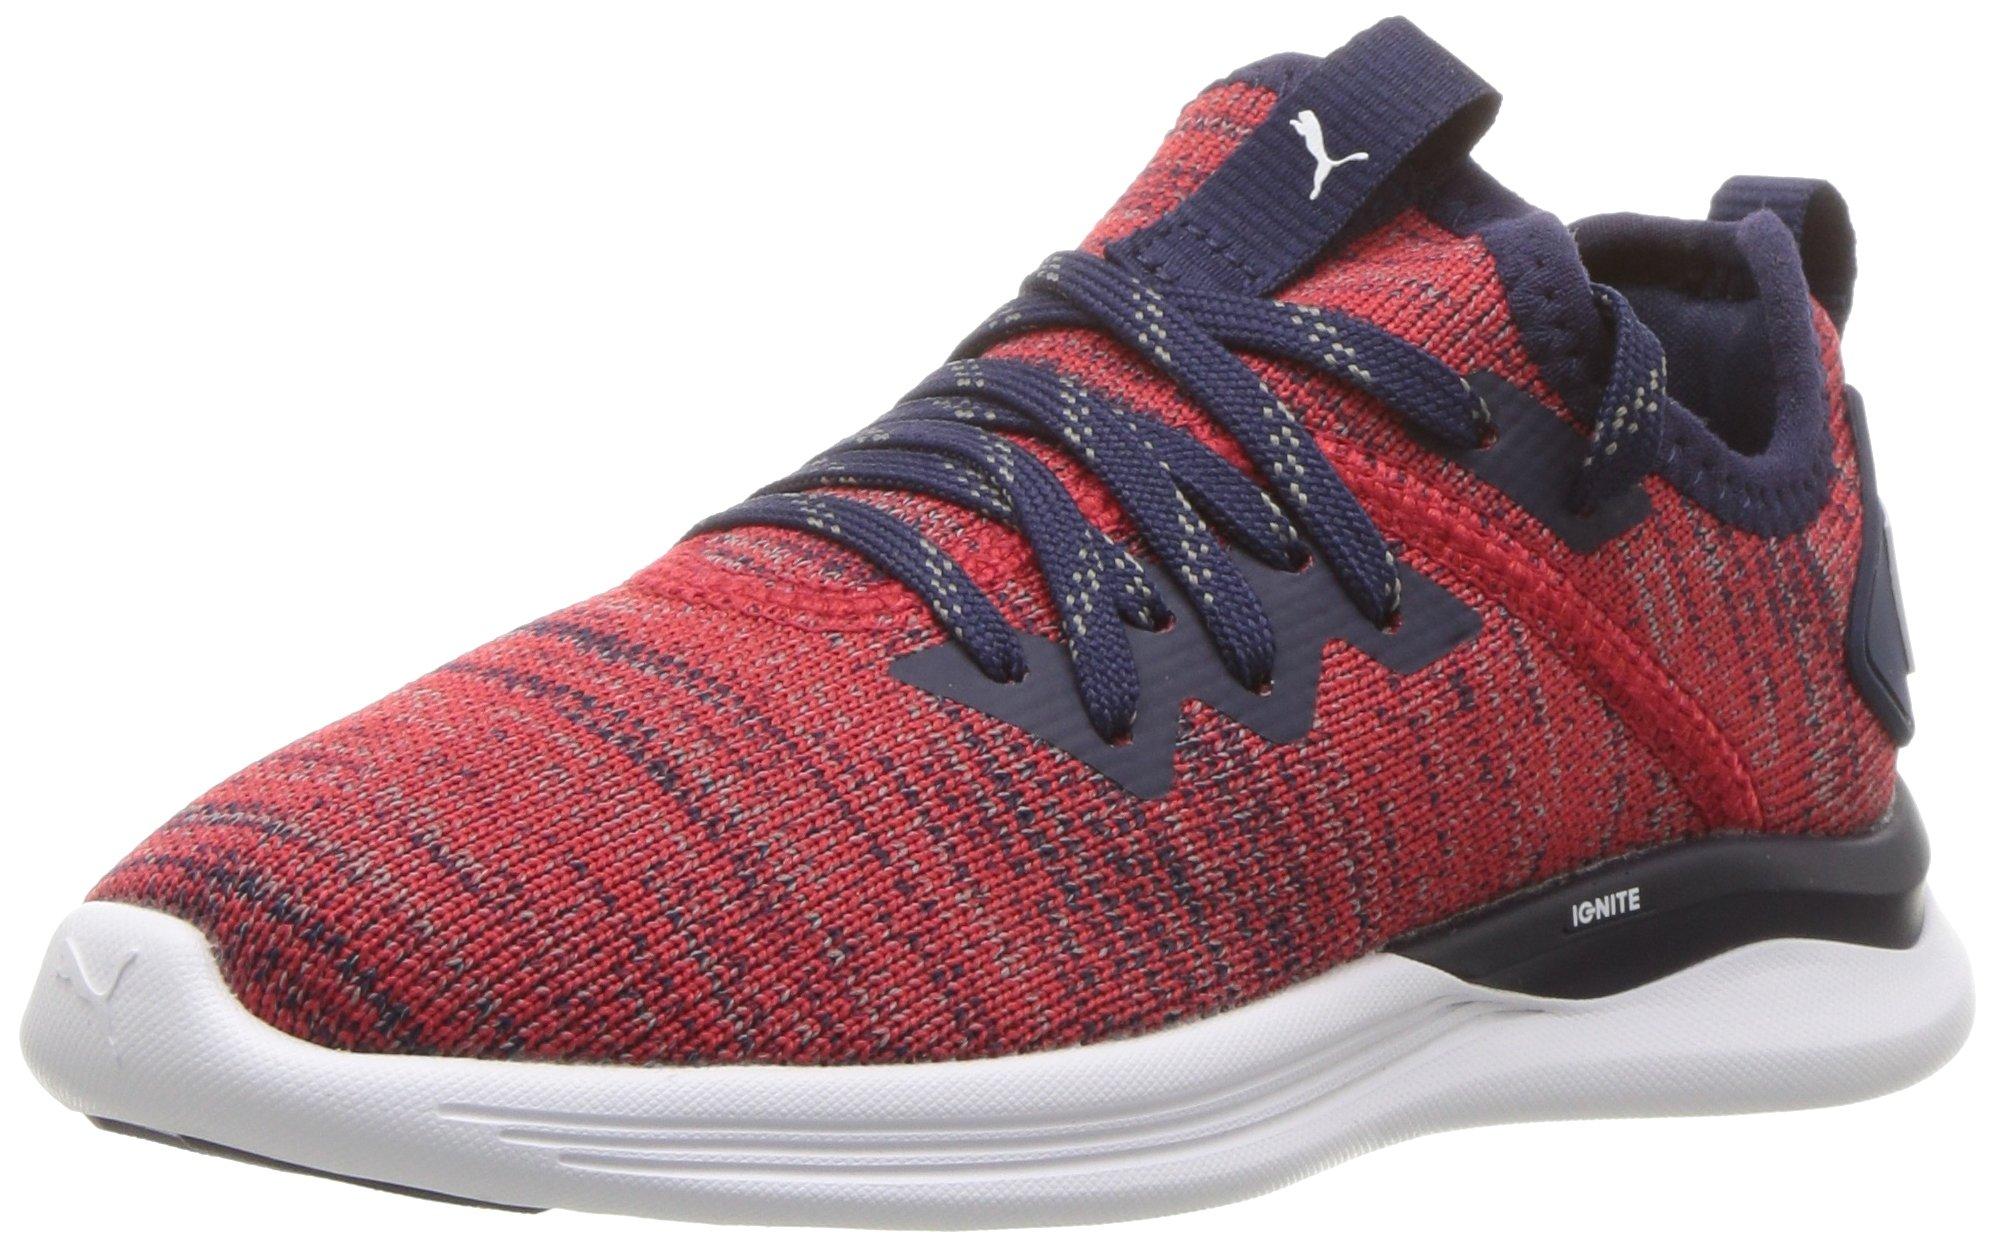 PUMA Unisex-Kids Ignite Flash Evoknit Sneaker, Ribbon Red-Peacoat White, 10.5 M US Little Kid